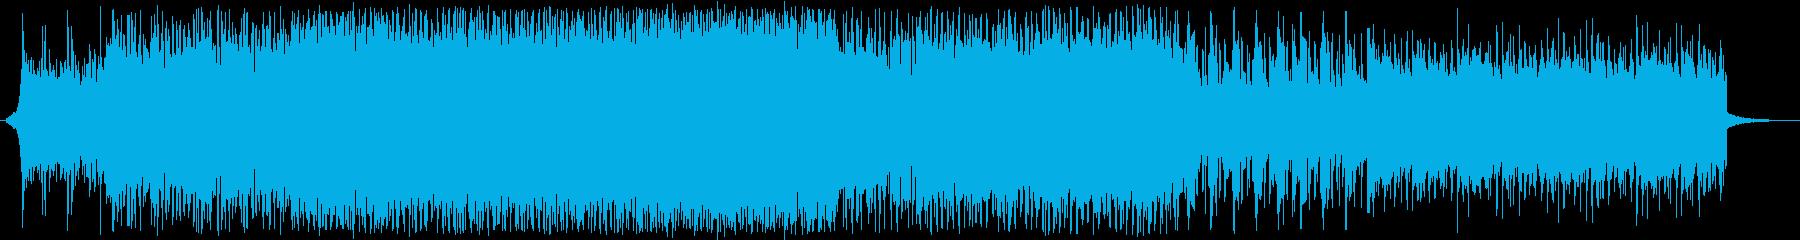 BGM_白熱する闘いの再生済みの波形